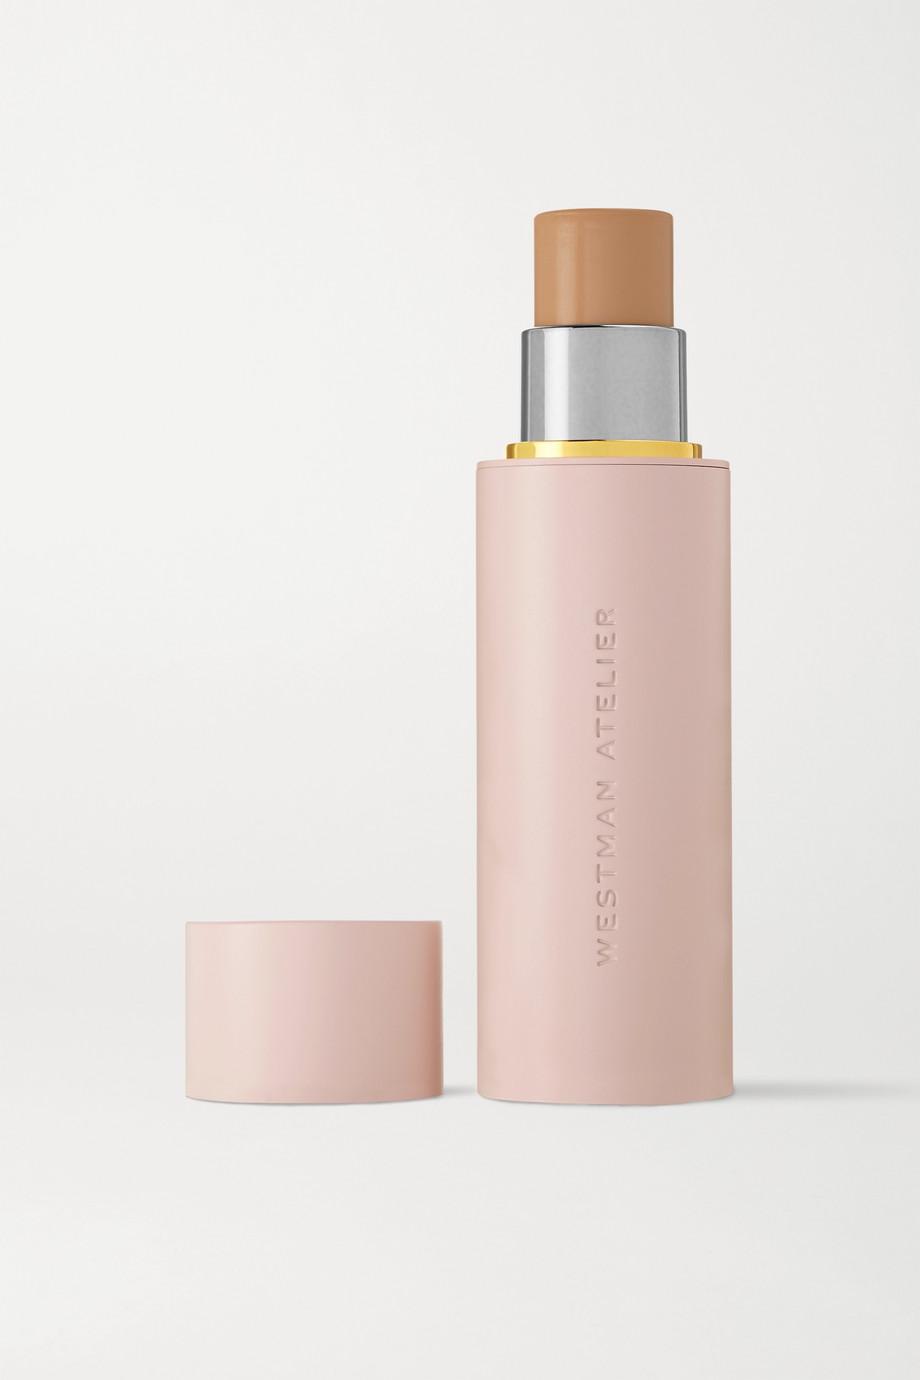 Westman Atelier | Vital Skin Foundation Stick - Atelier IX, 9g | NET-A-PORTER.COM